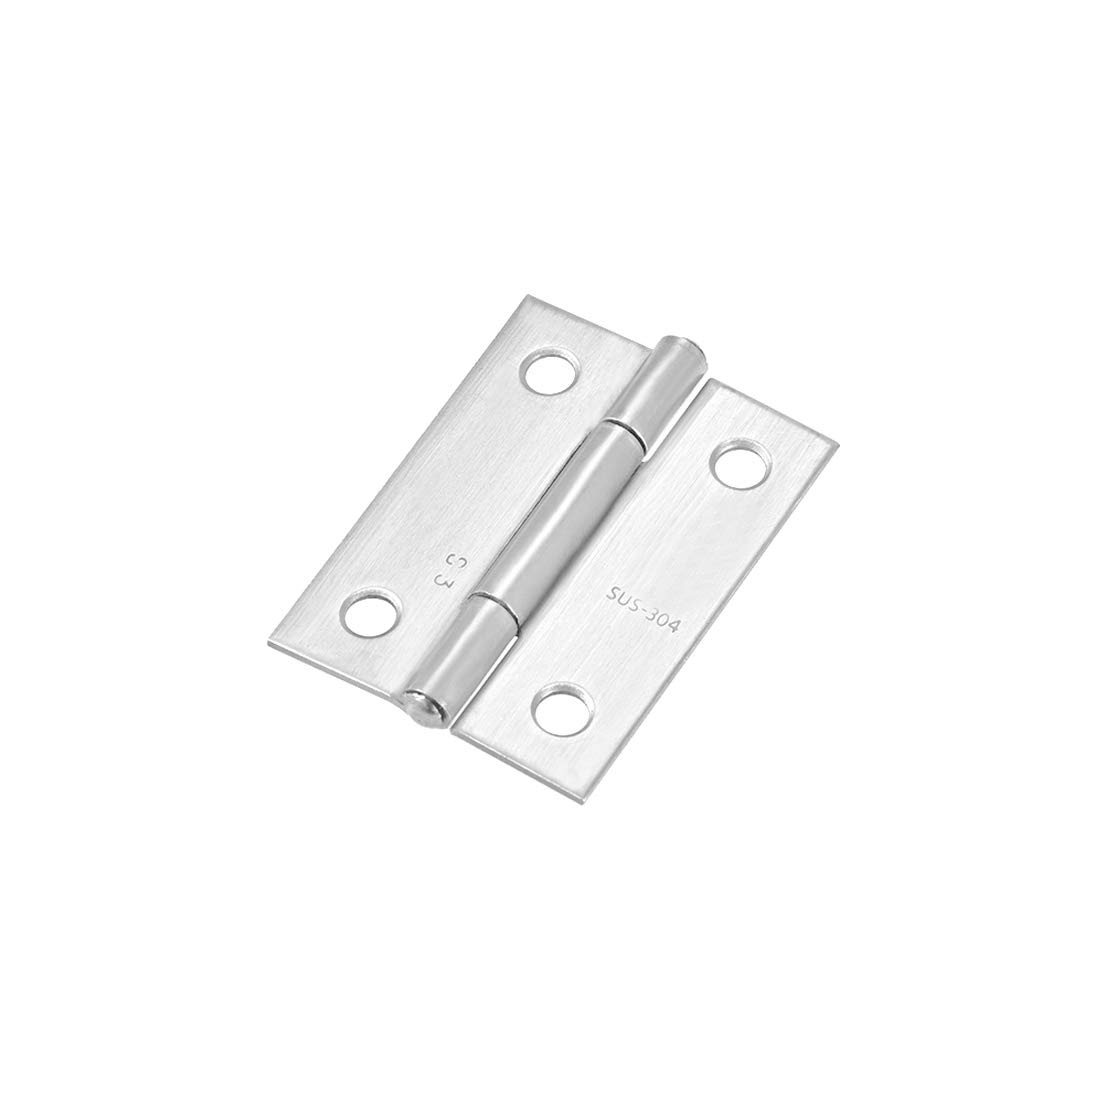 uxcell 1.5inch Hinge Silver Door Cabinet Hinges